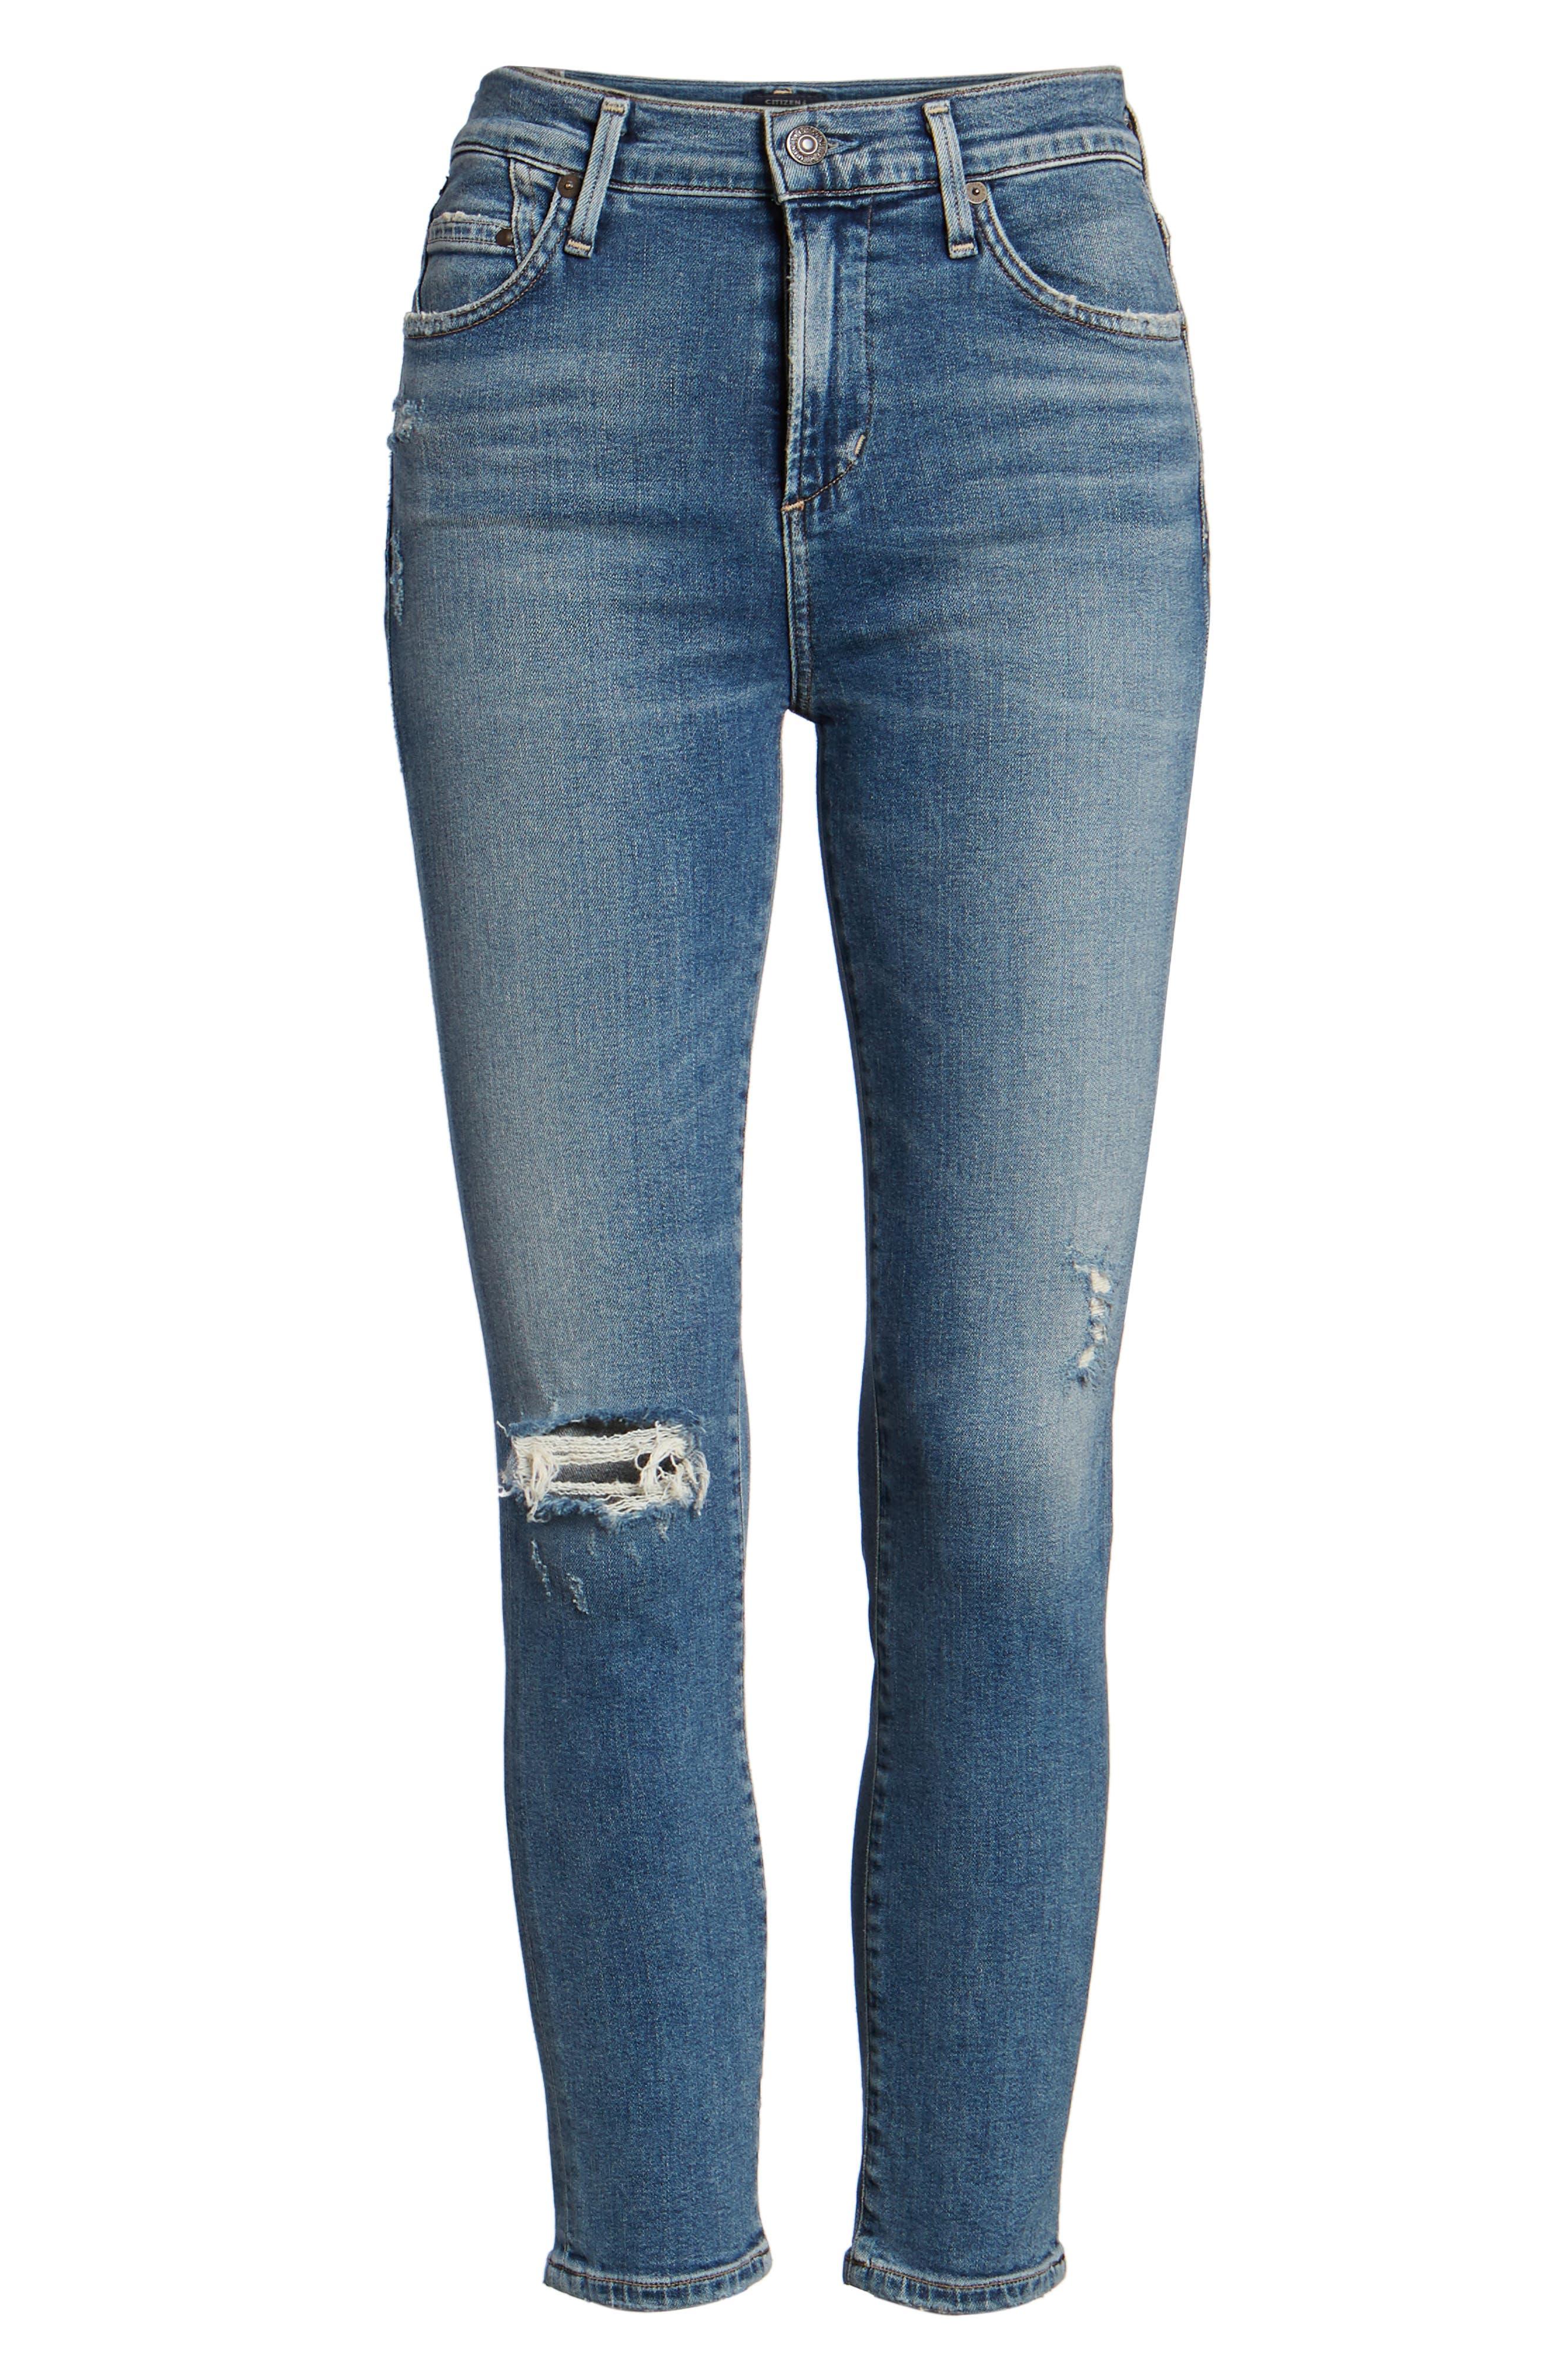 Rocket High Waist Crop Skinny Jeans,                             Alternate thumbnail 7, color,                             427